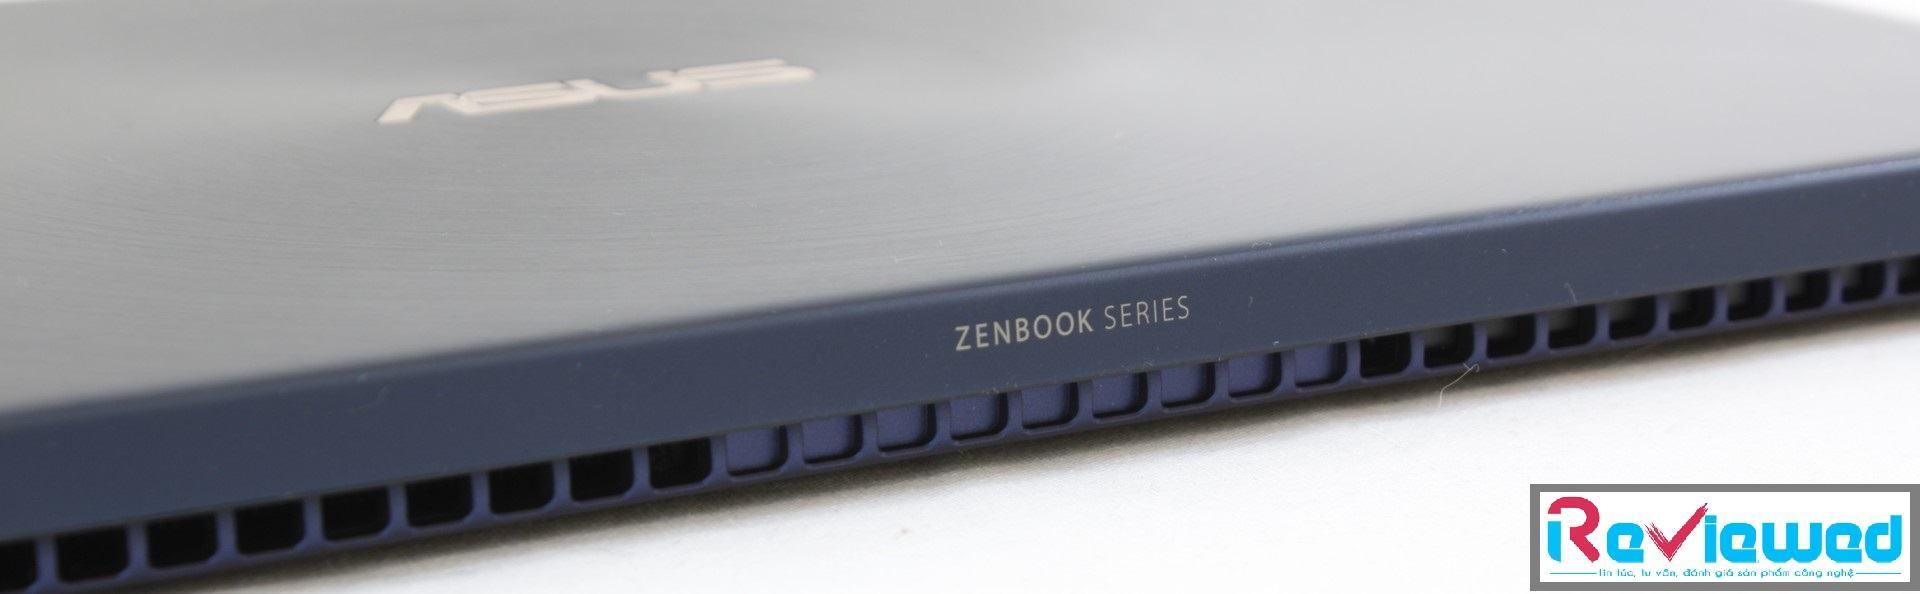 đánh giá laptop Asus ZenBook 13 UX333FA